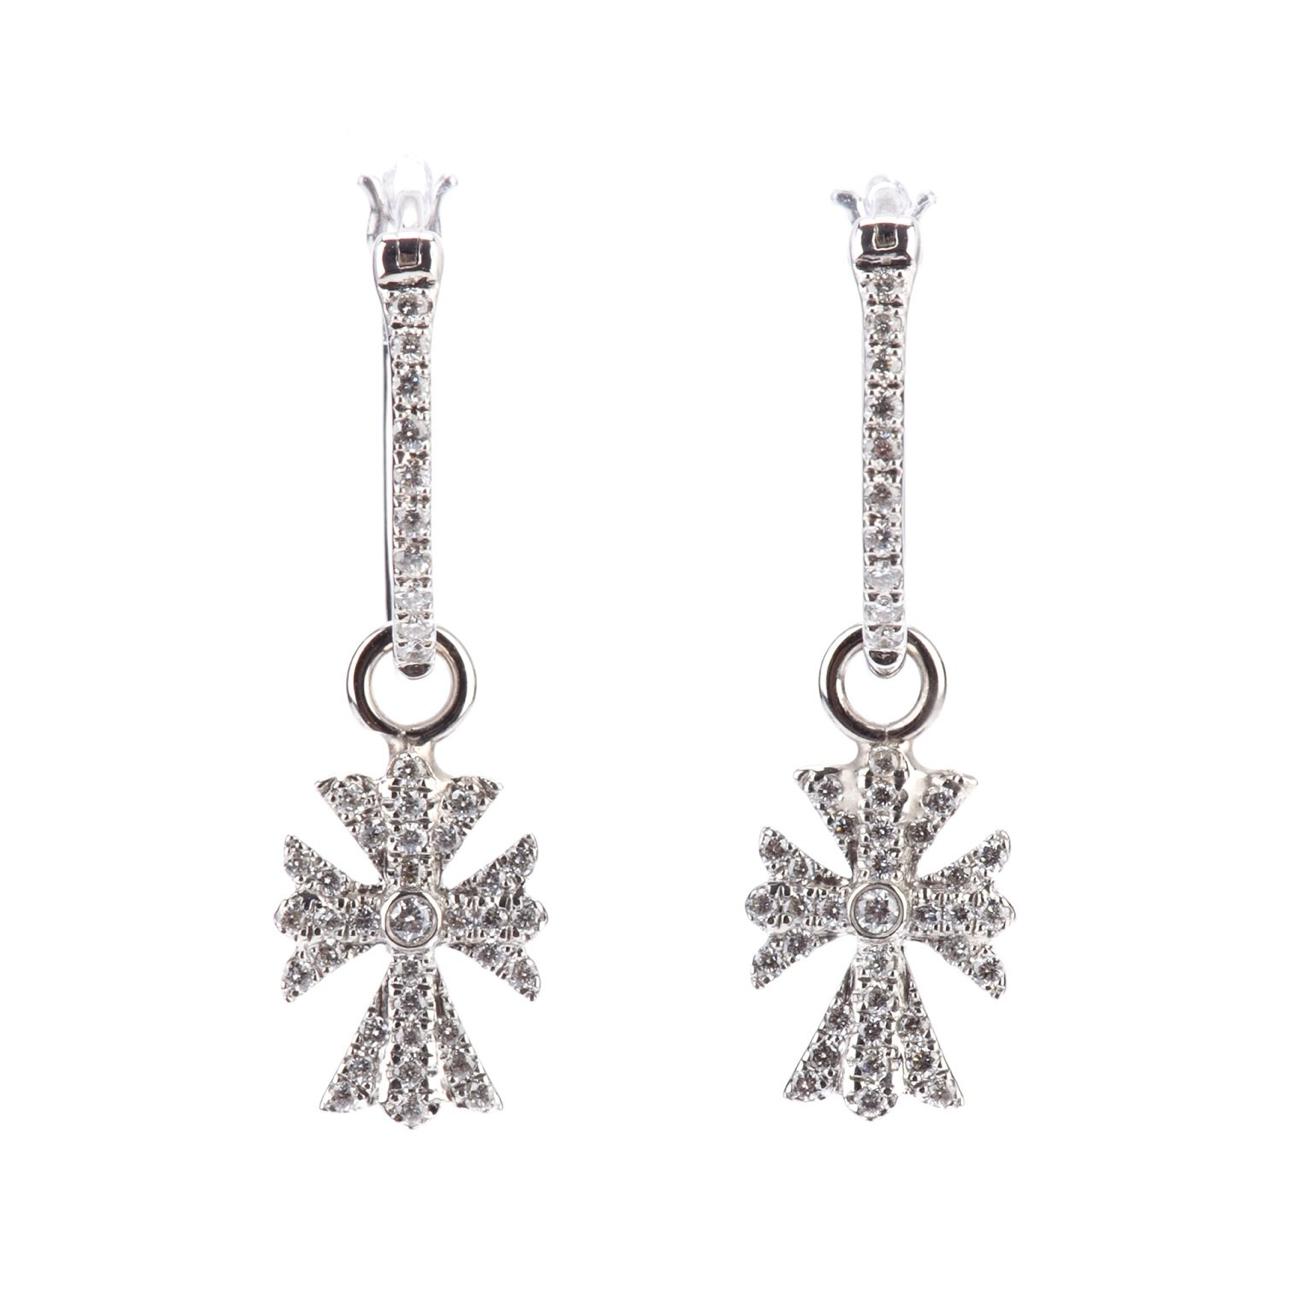 Elise Dray's diamond cross earrings